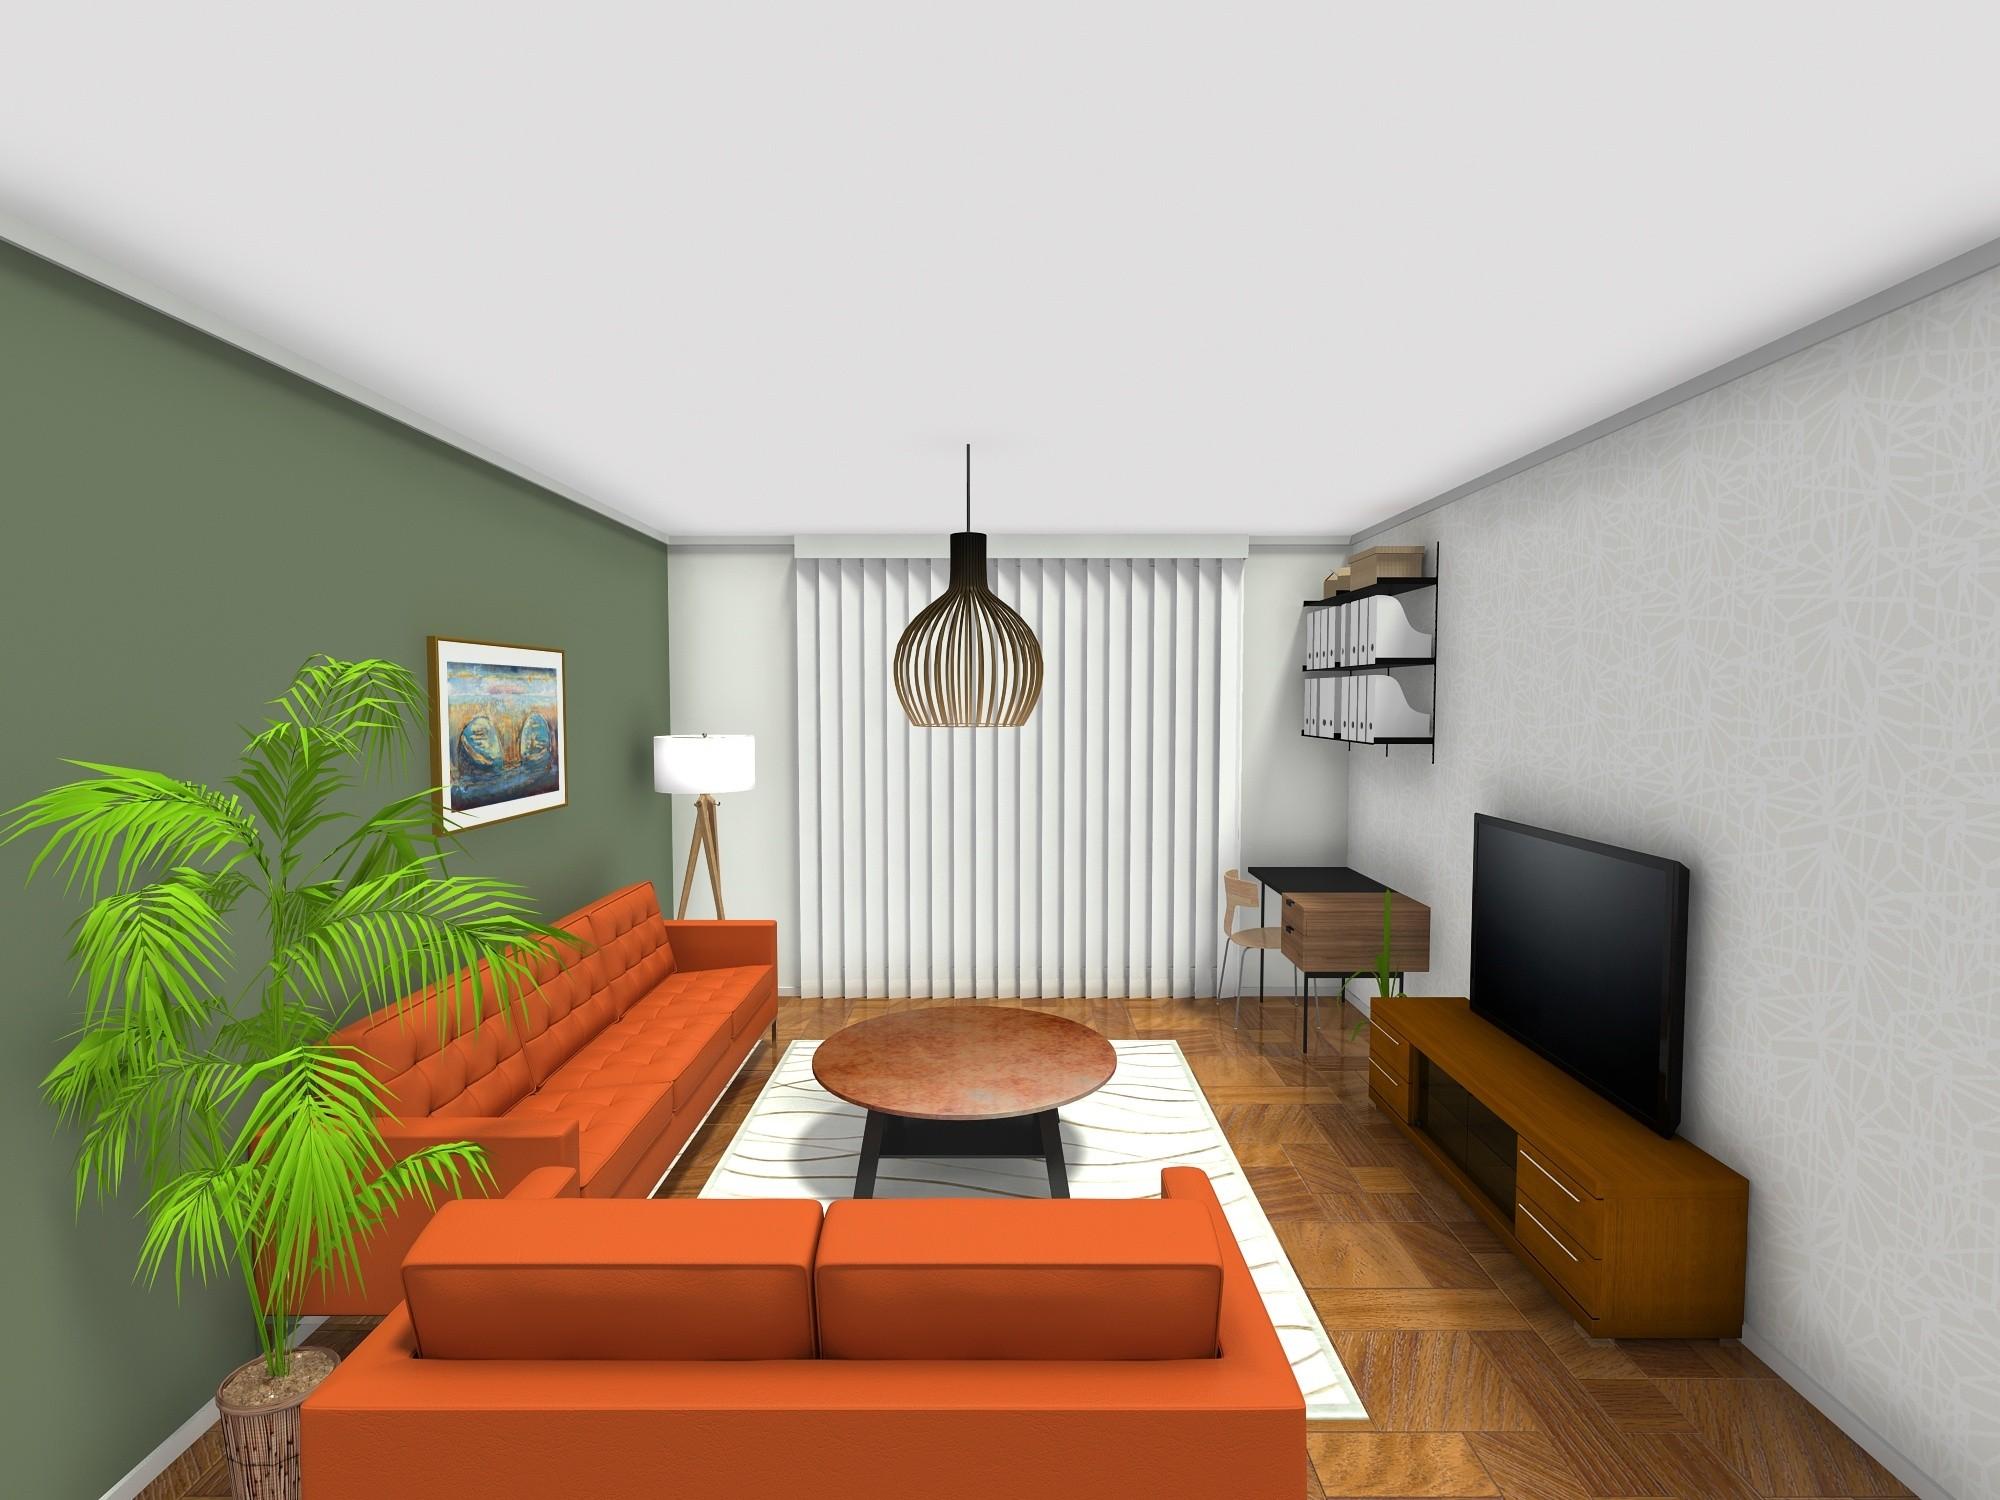 dvosoban stan 52 m2, veliki dnevni boravak